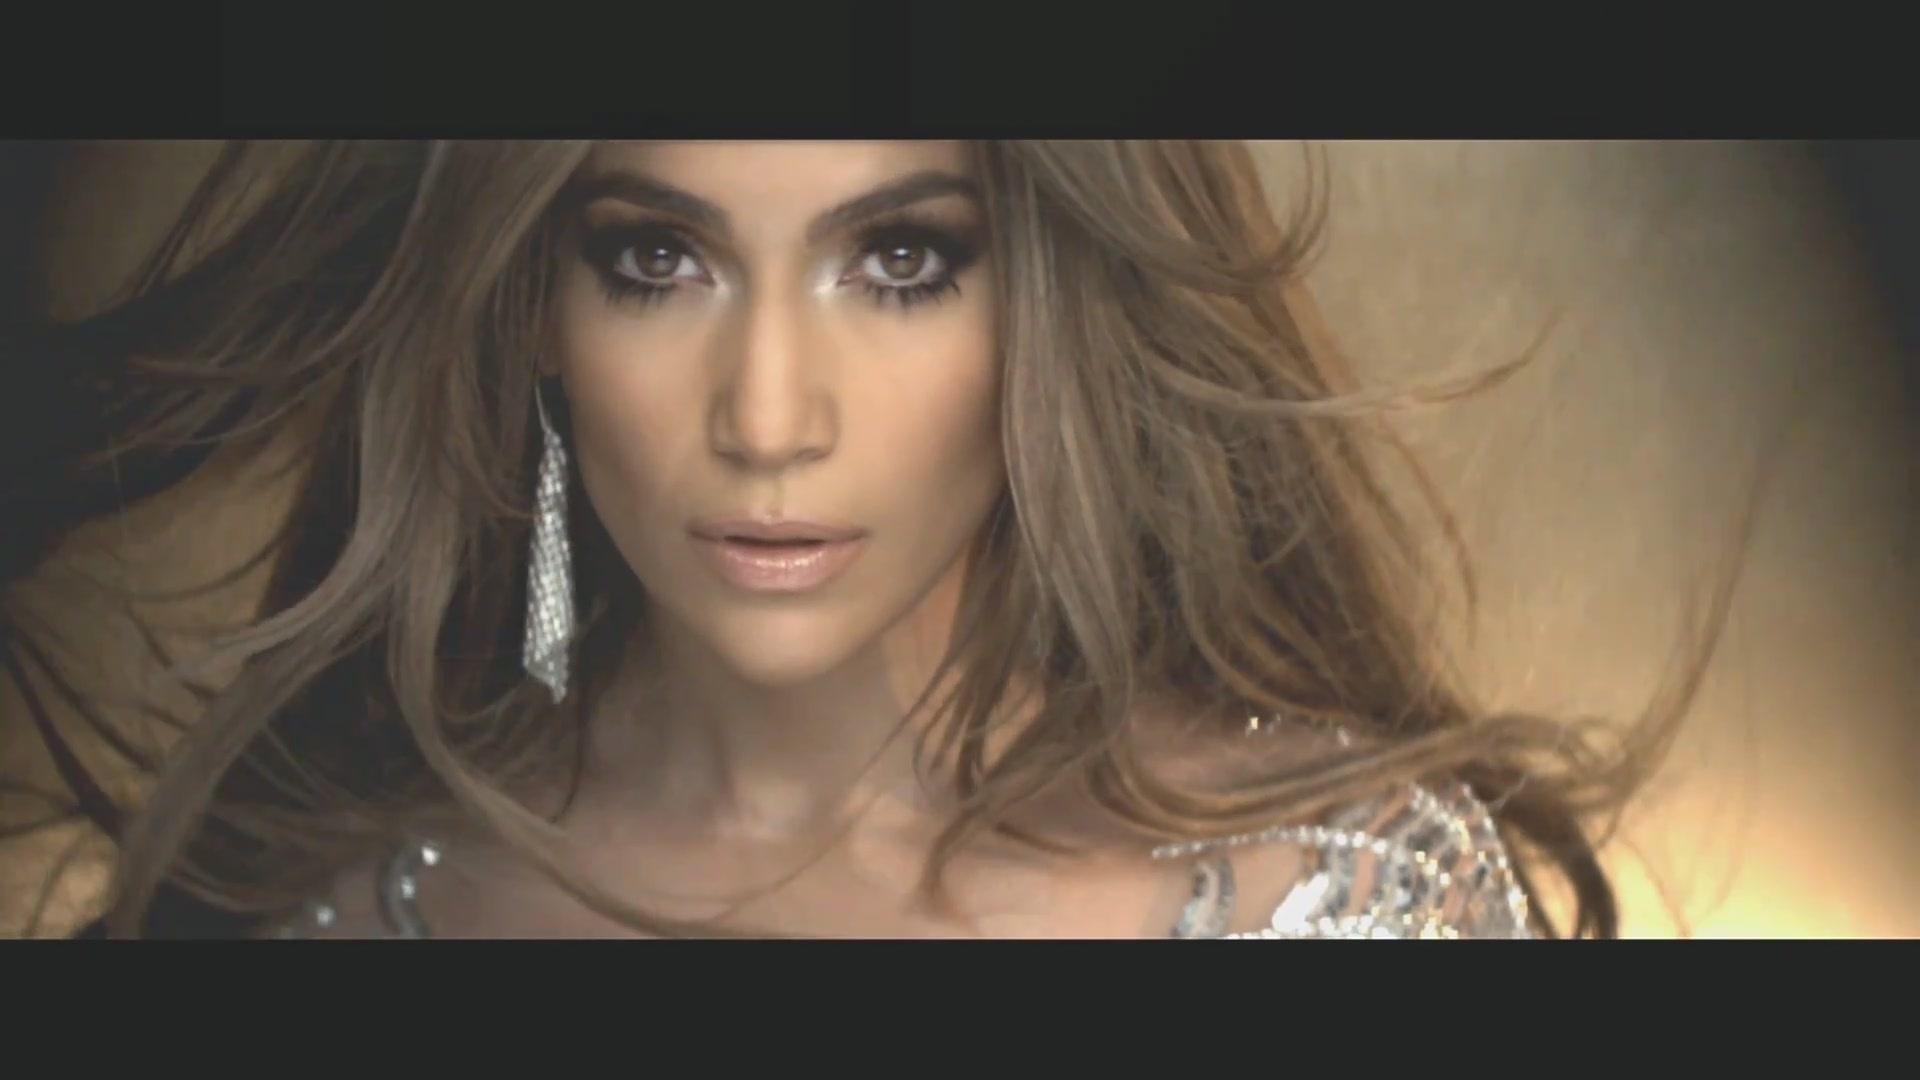 553572 1920x1080px Jennifer Lopez On The Floor, 148.96 KB, Music ...